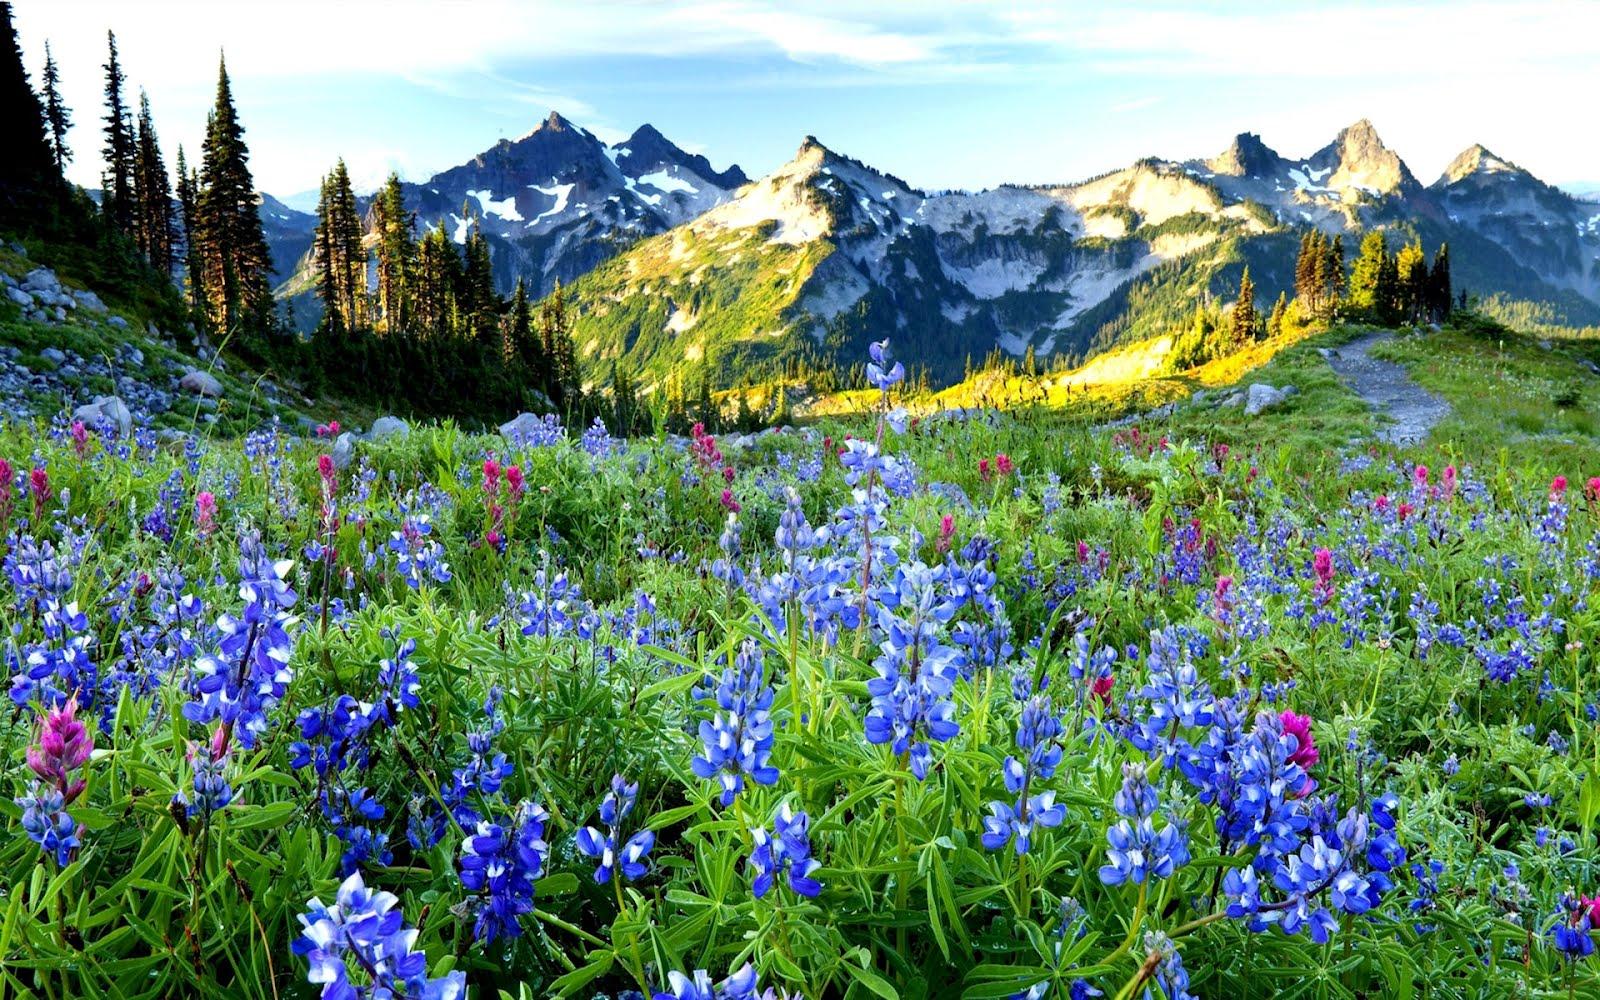 http://4.bp.blogspot.com/-g3NJDVbm1CY/Txb-5wLY3AI/AAAAAAAAuiM/bGqso8iH2f8/s1600/amanecer-en-el-paraiso-paradise-nature-landscape.jpg